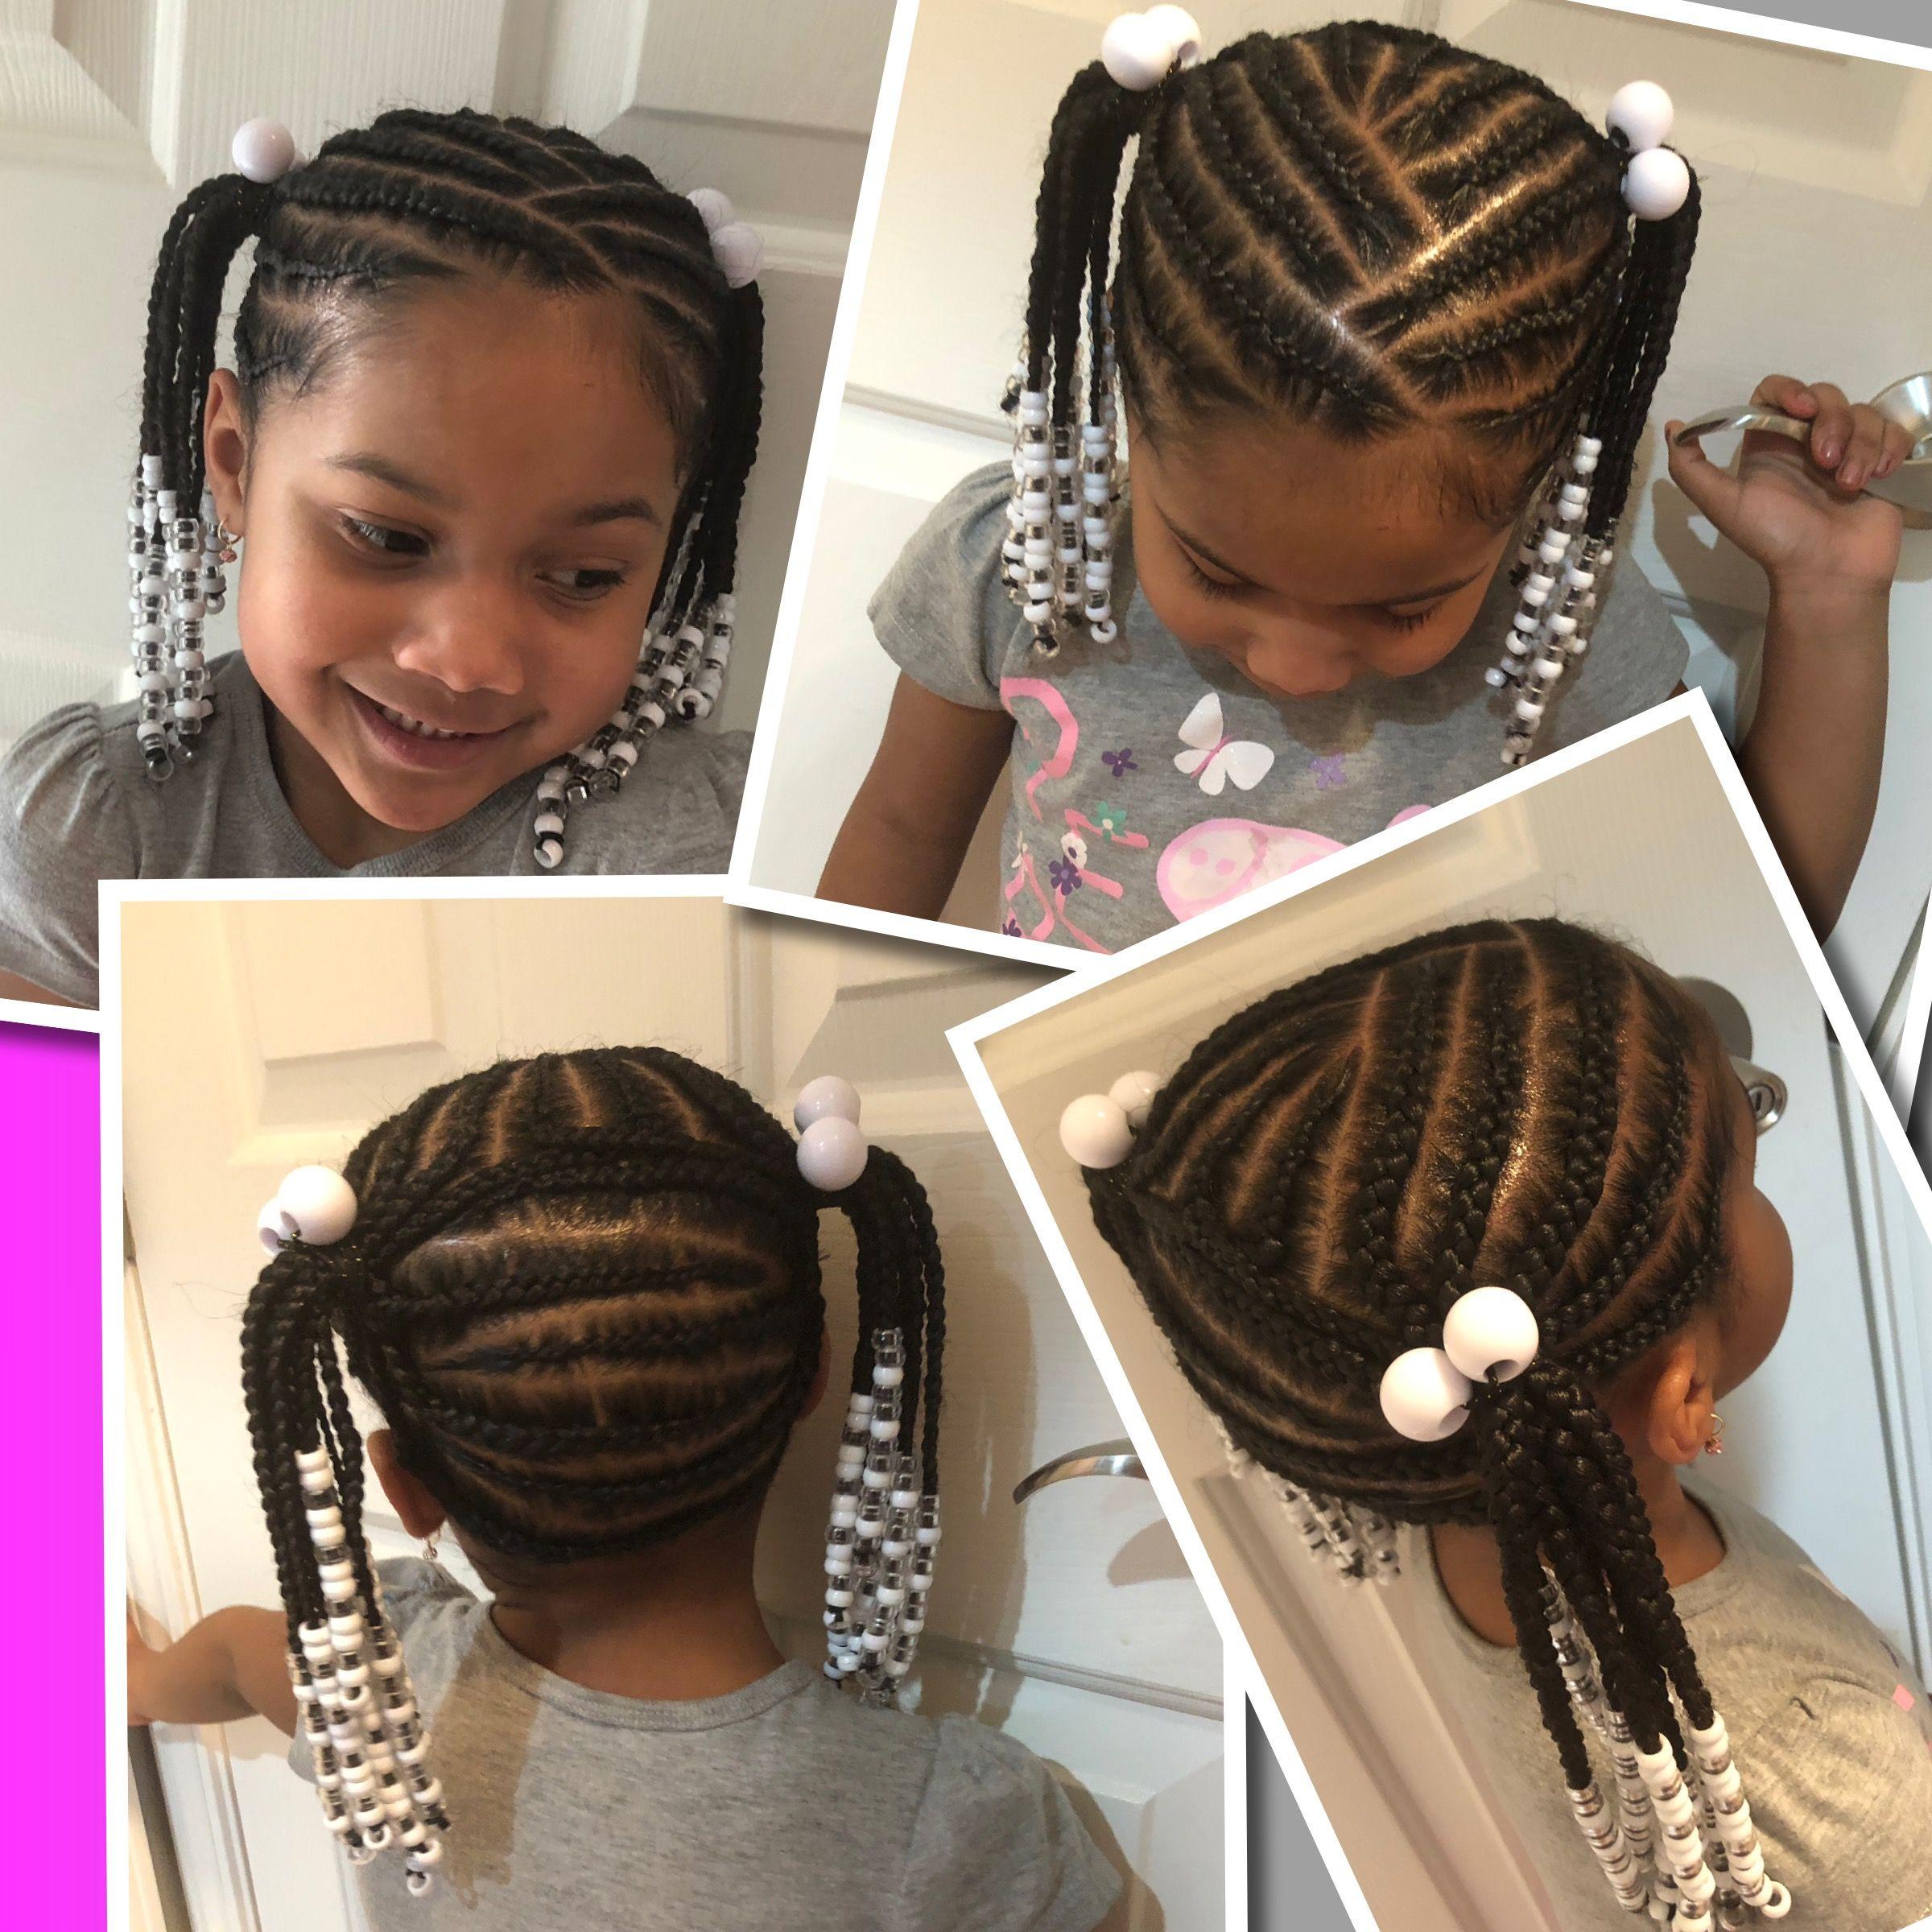 Little Girl Braids Two Ponytails Little Girl Braids Little Girl Braid Hairstyles Girls Hairstyles Braids